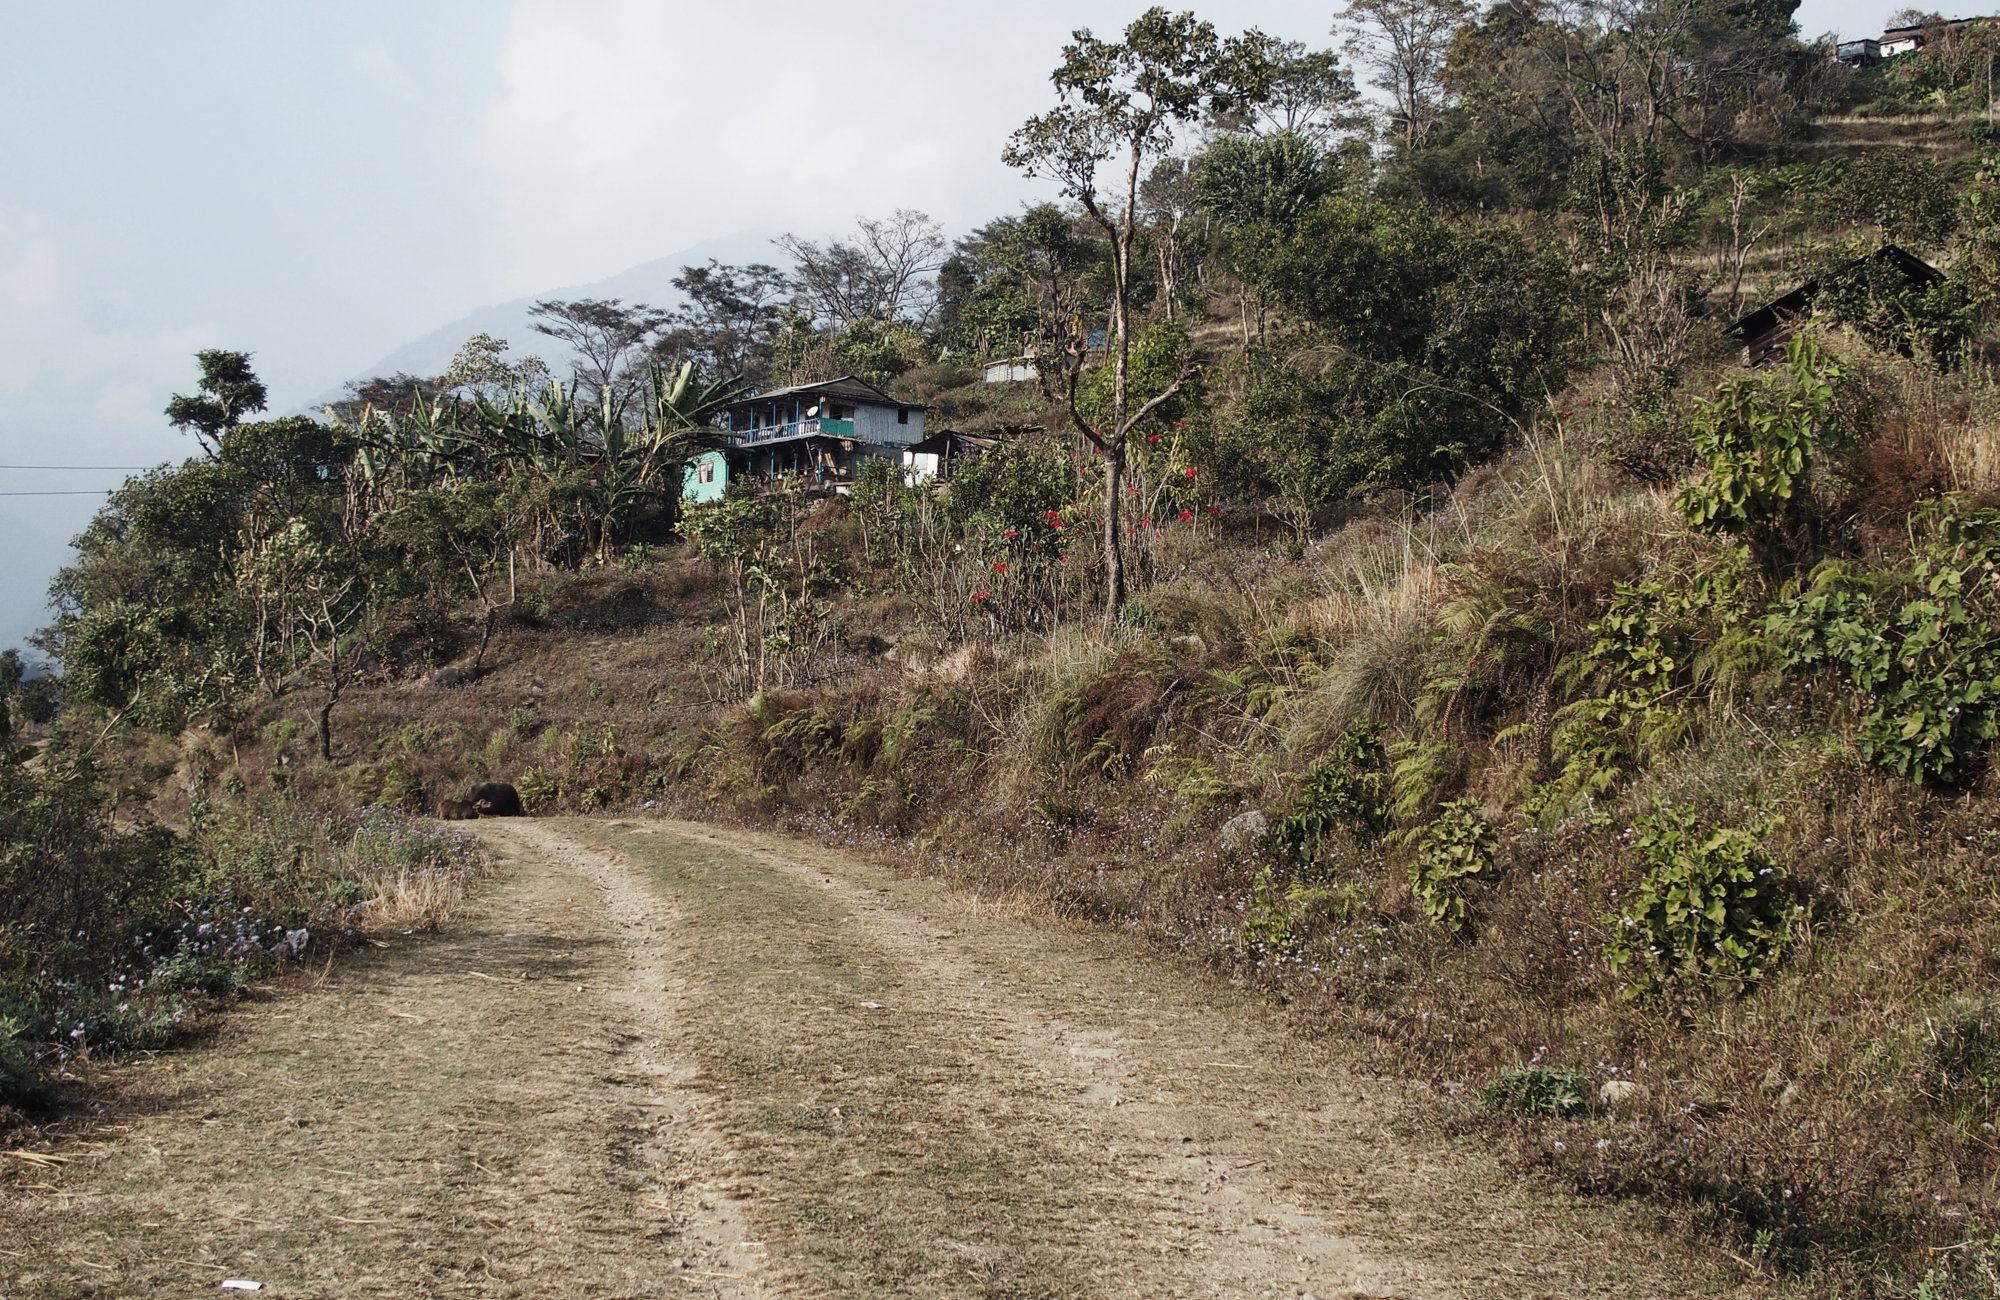 Felder am Annapurna Circuit